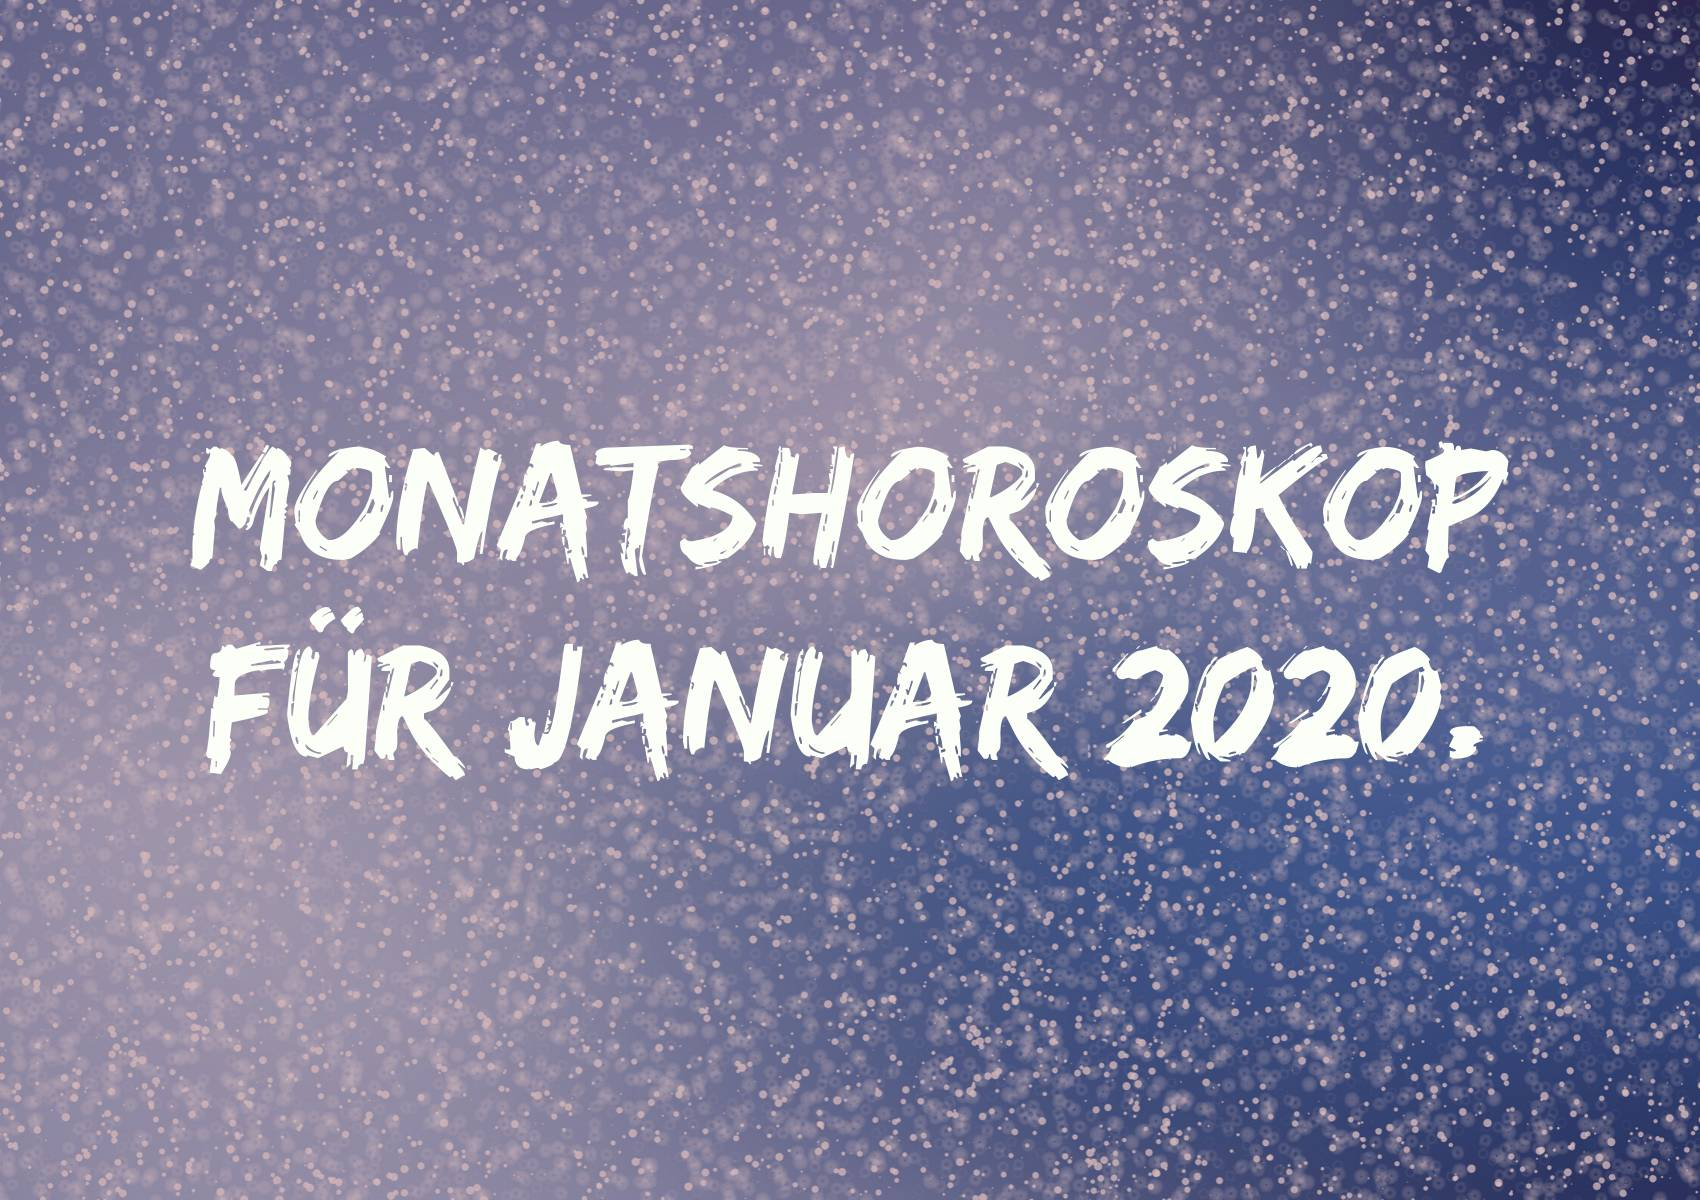 Monatshoroskop für Januar 2020.